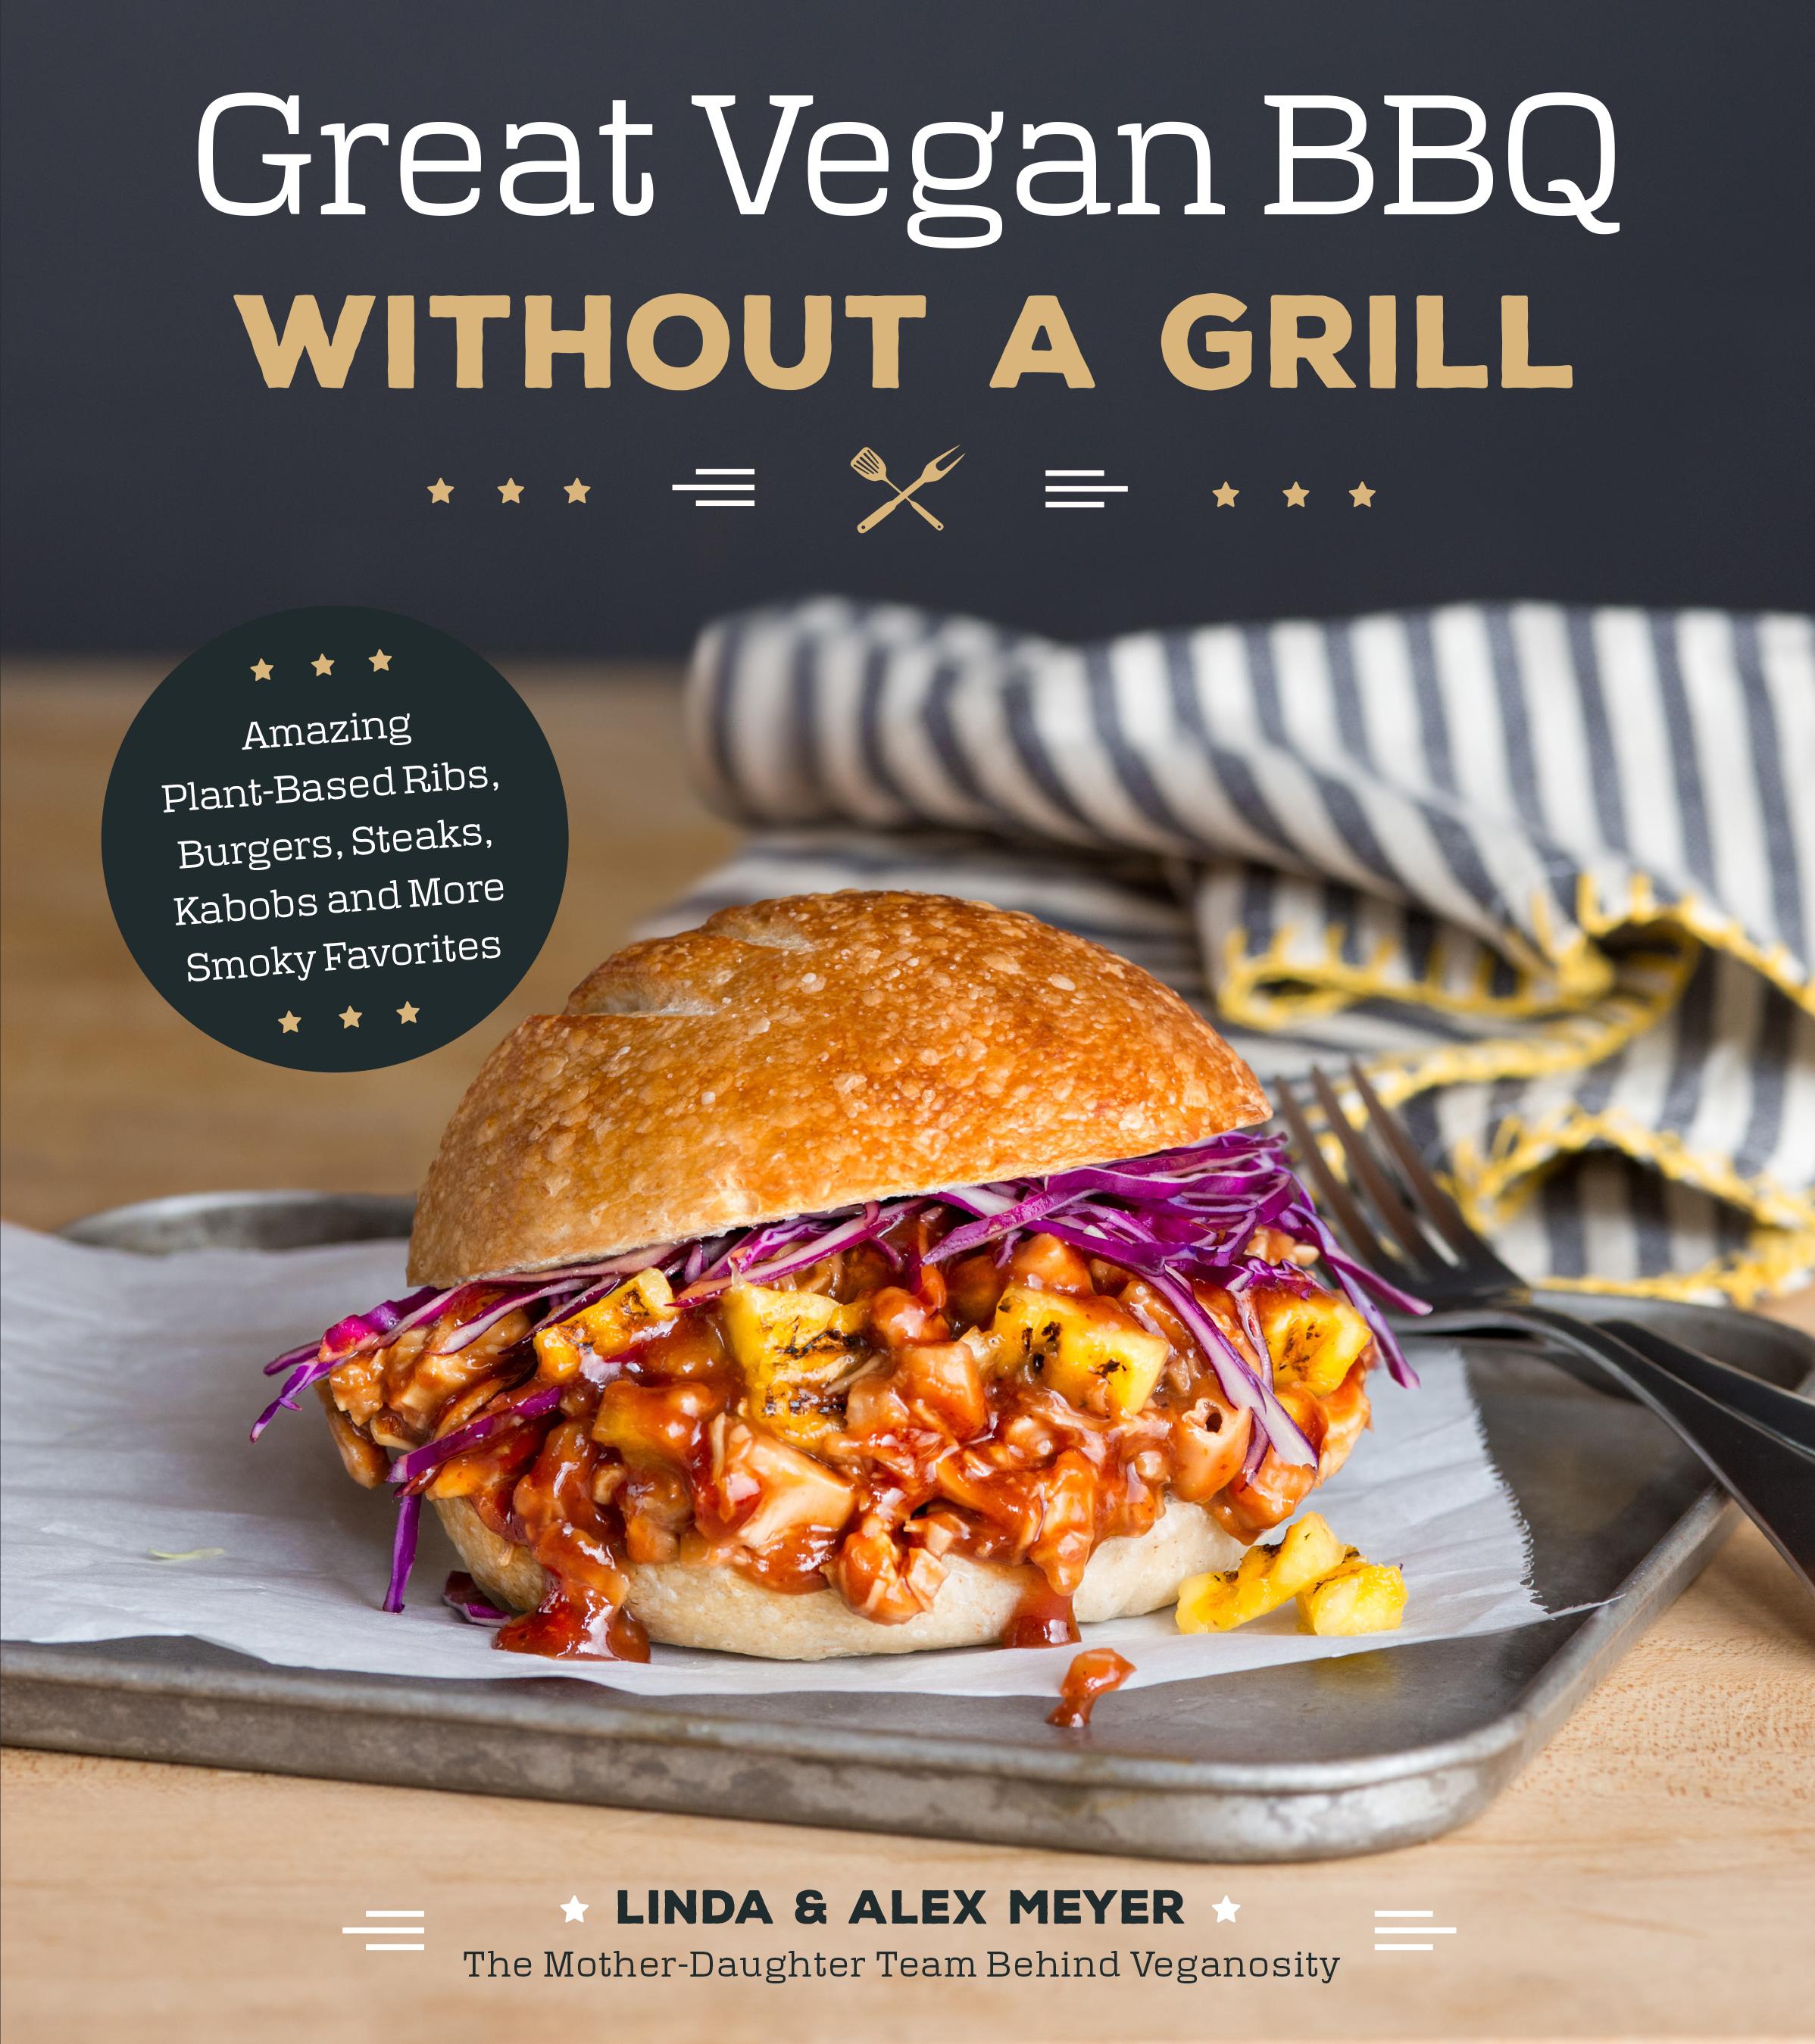 Great Vegan BBQ Cookbook by Veganosity